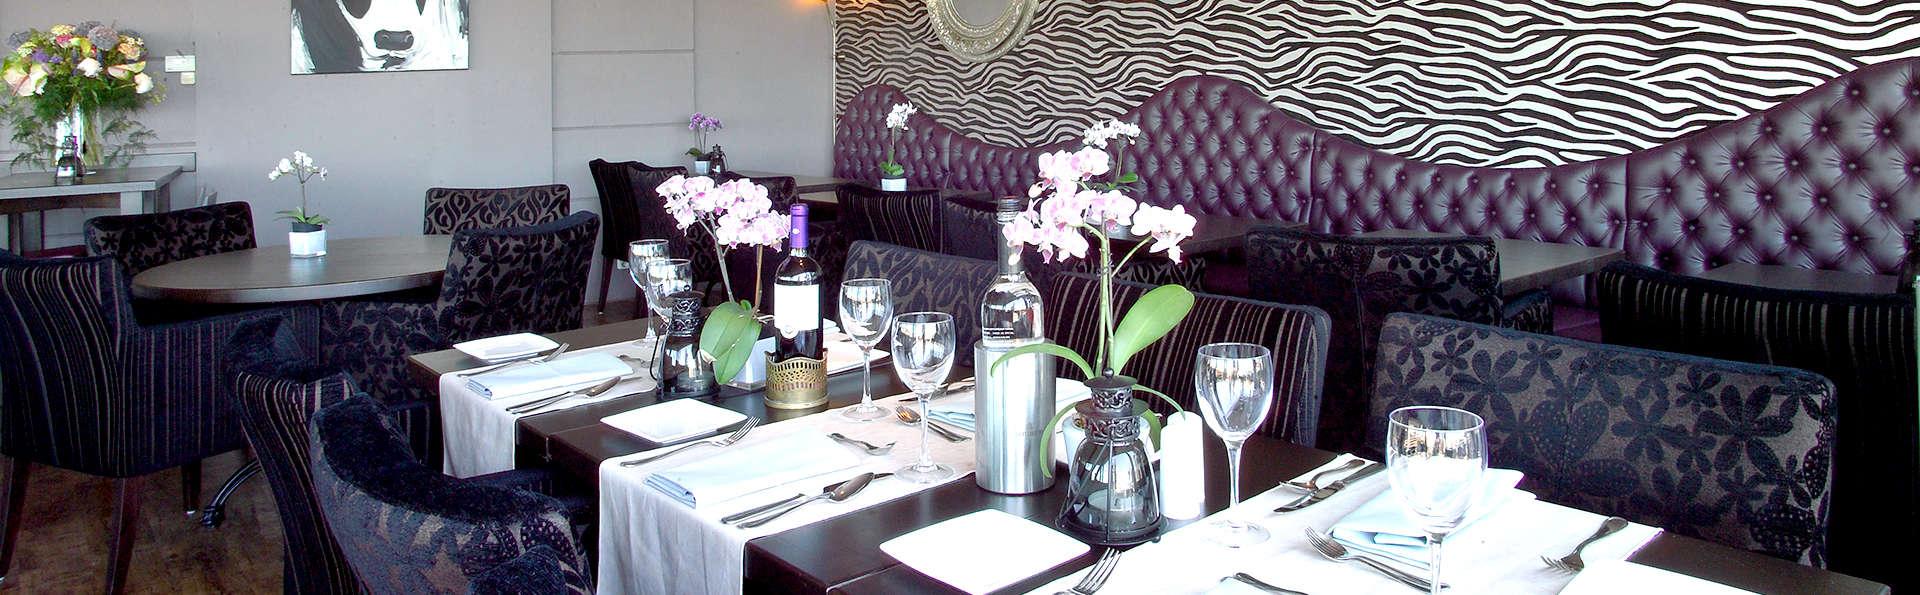 Logis Hotel Restaurant Zeezicht - Edit_Restaurant.jpg